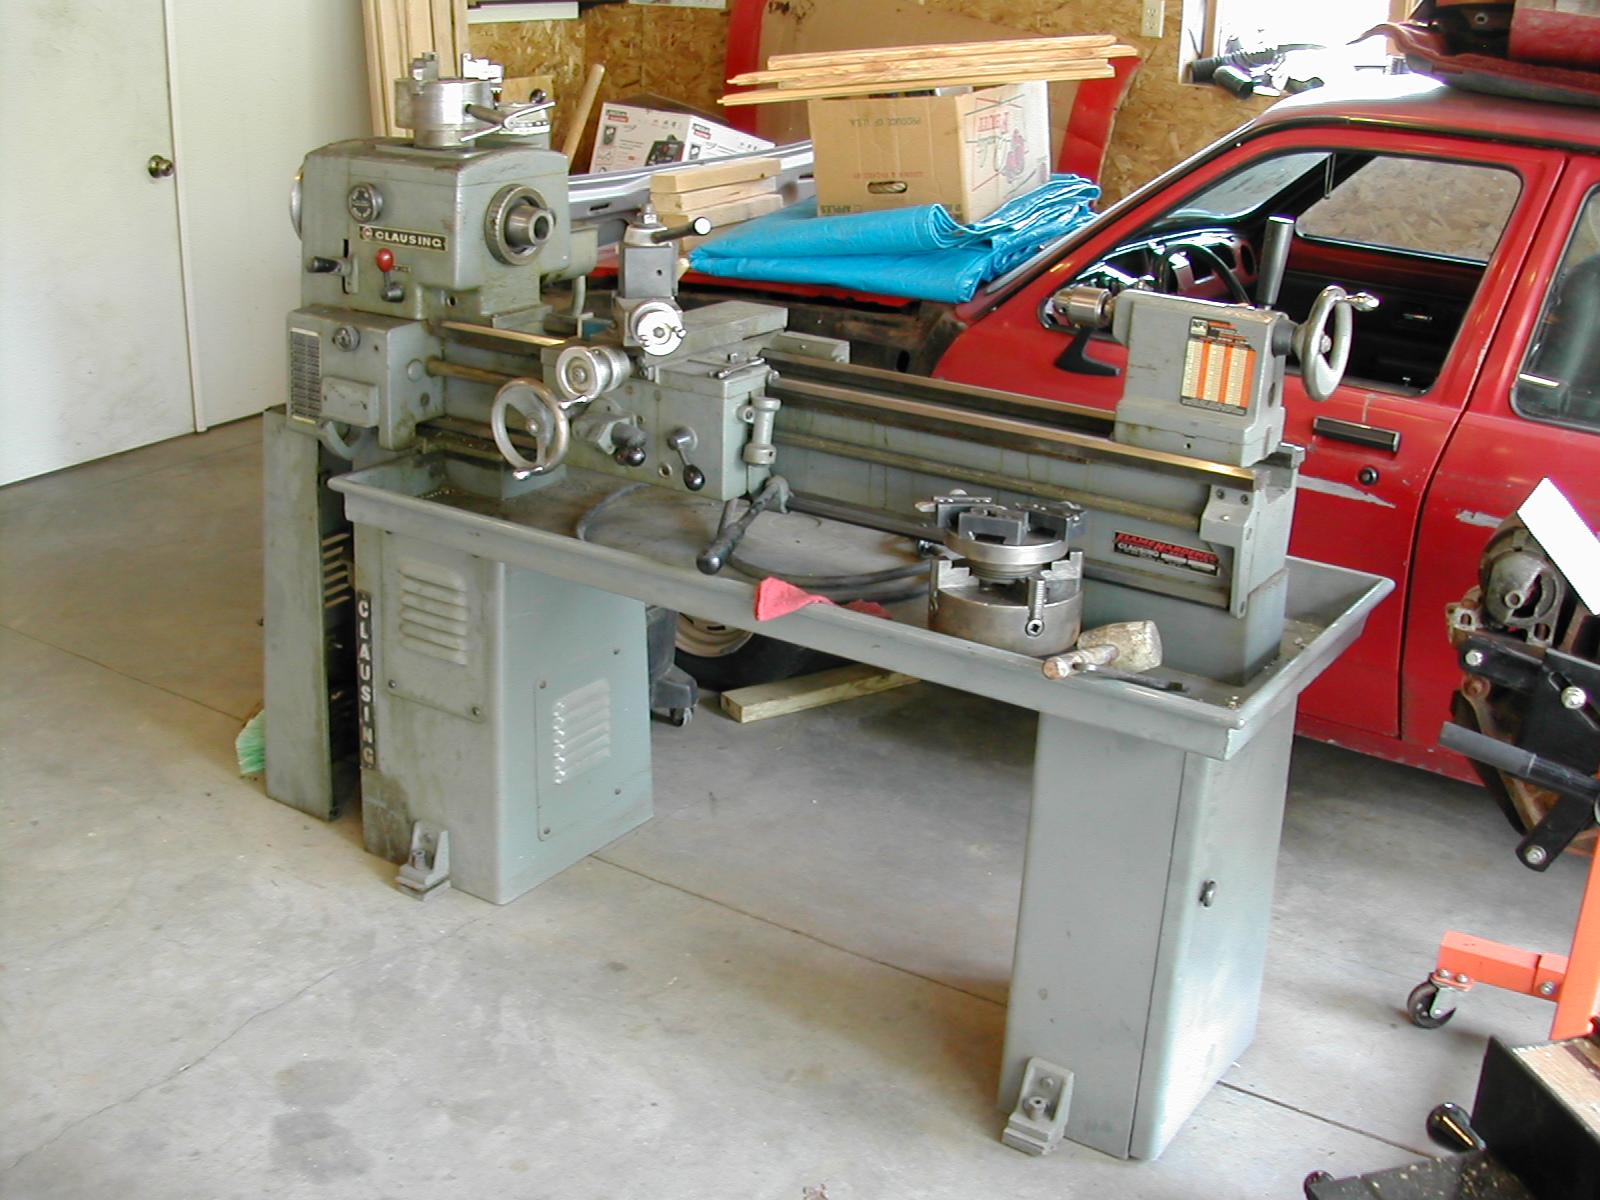 File:Clausing 5912 metalworking lathe.jpg - Wikimedia Commons